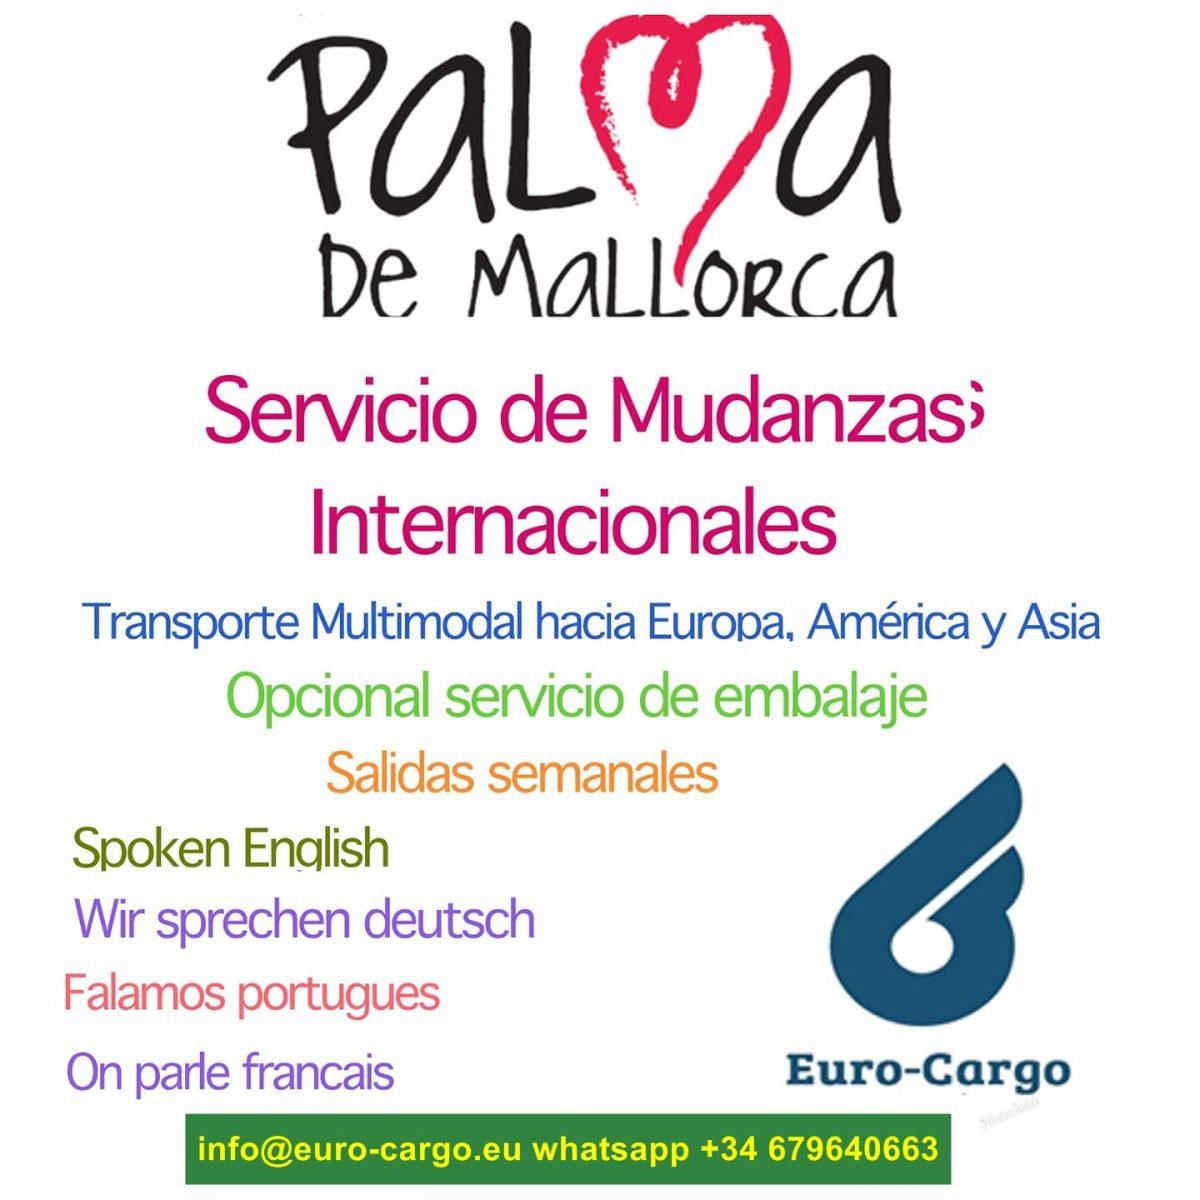 Mudanzas-Islas-Baleares-2-1200x1200.jpg